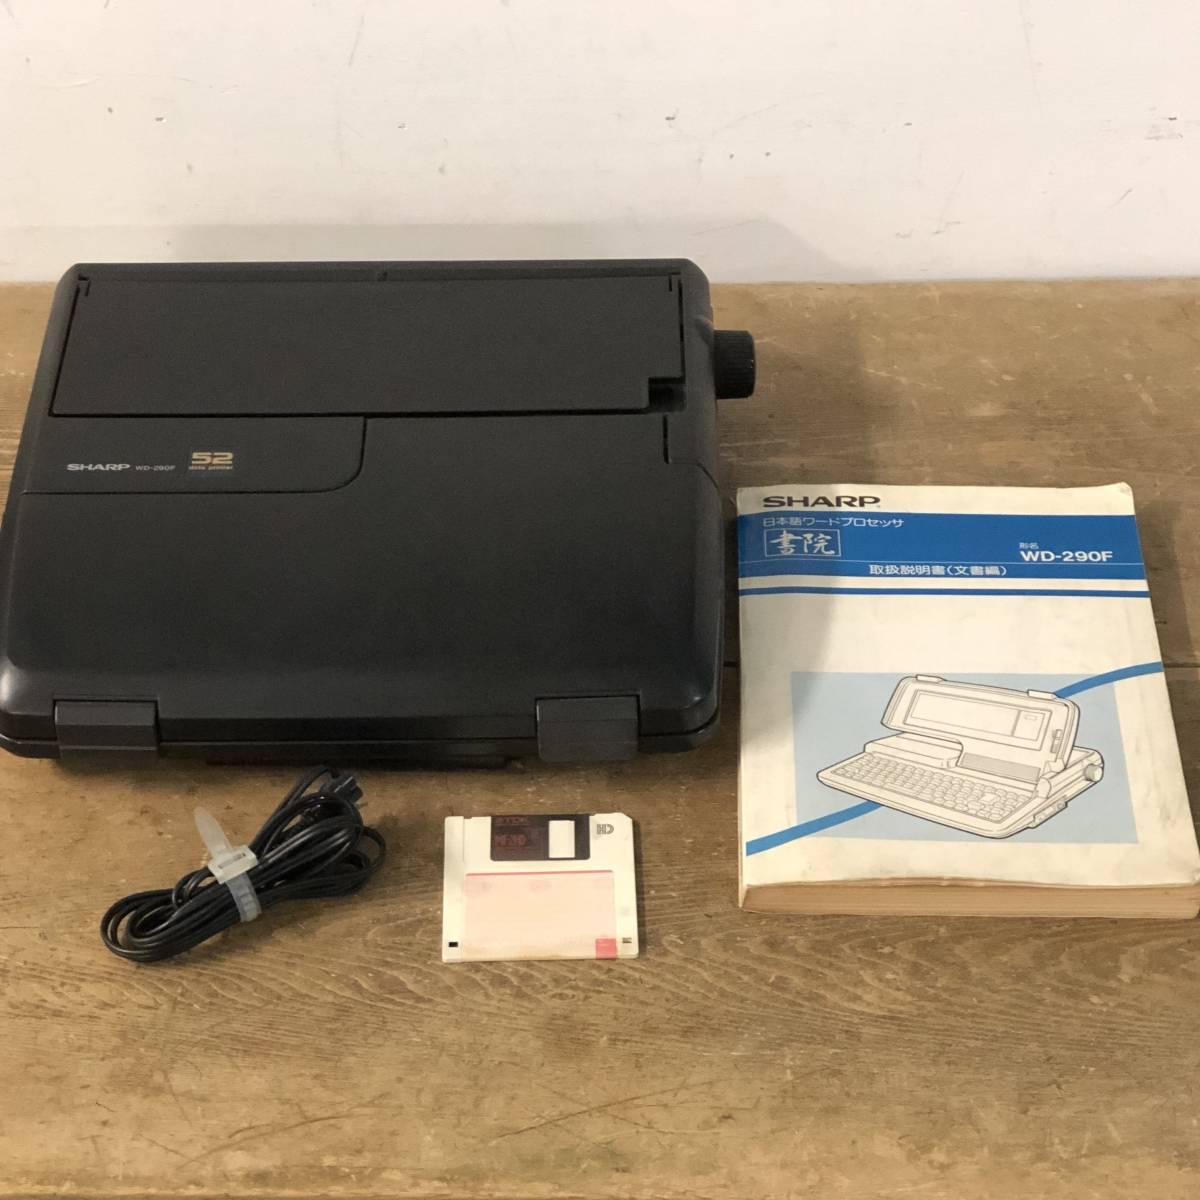 SHARP シャープ 日本語ワードプロセッサ 書院 WD-290W ワープロ 52ドットプリンター 取扱説明書 システムフロッピー 通電確認済 &_画像2